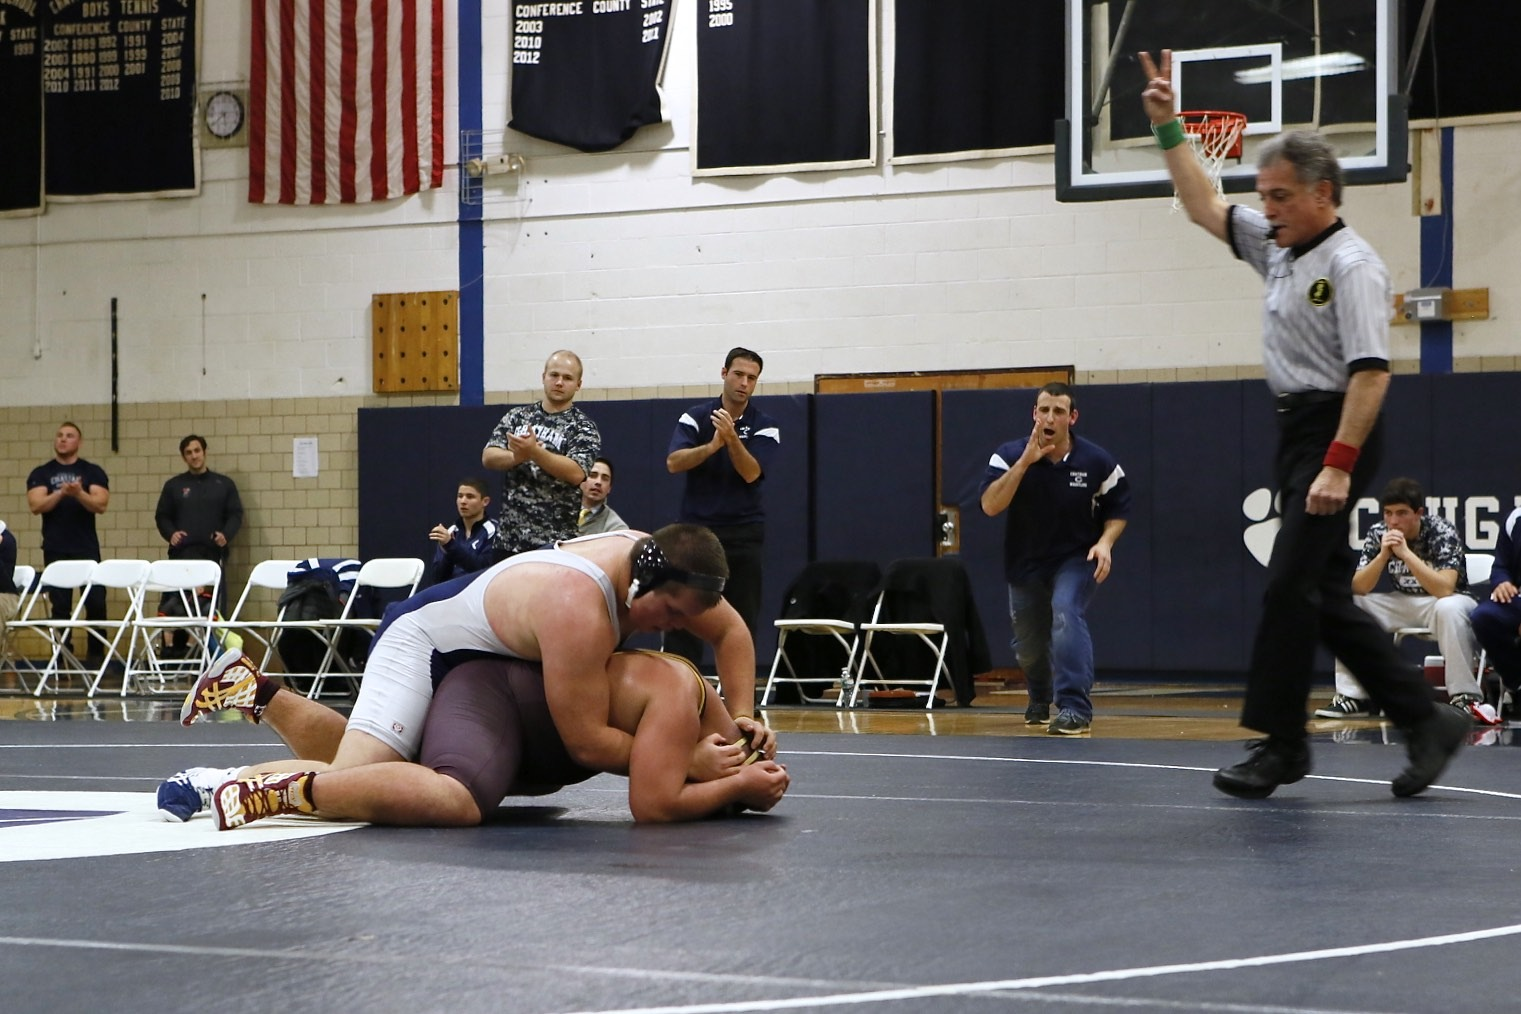 a9edef0cbbf99ac7829f_Wrestling_vs._Madison_1538.jpg